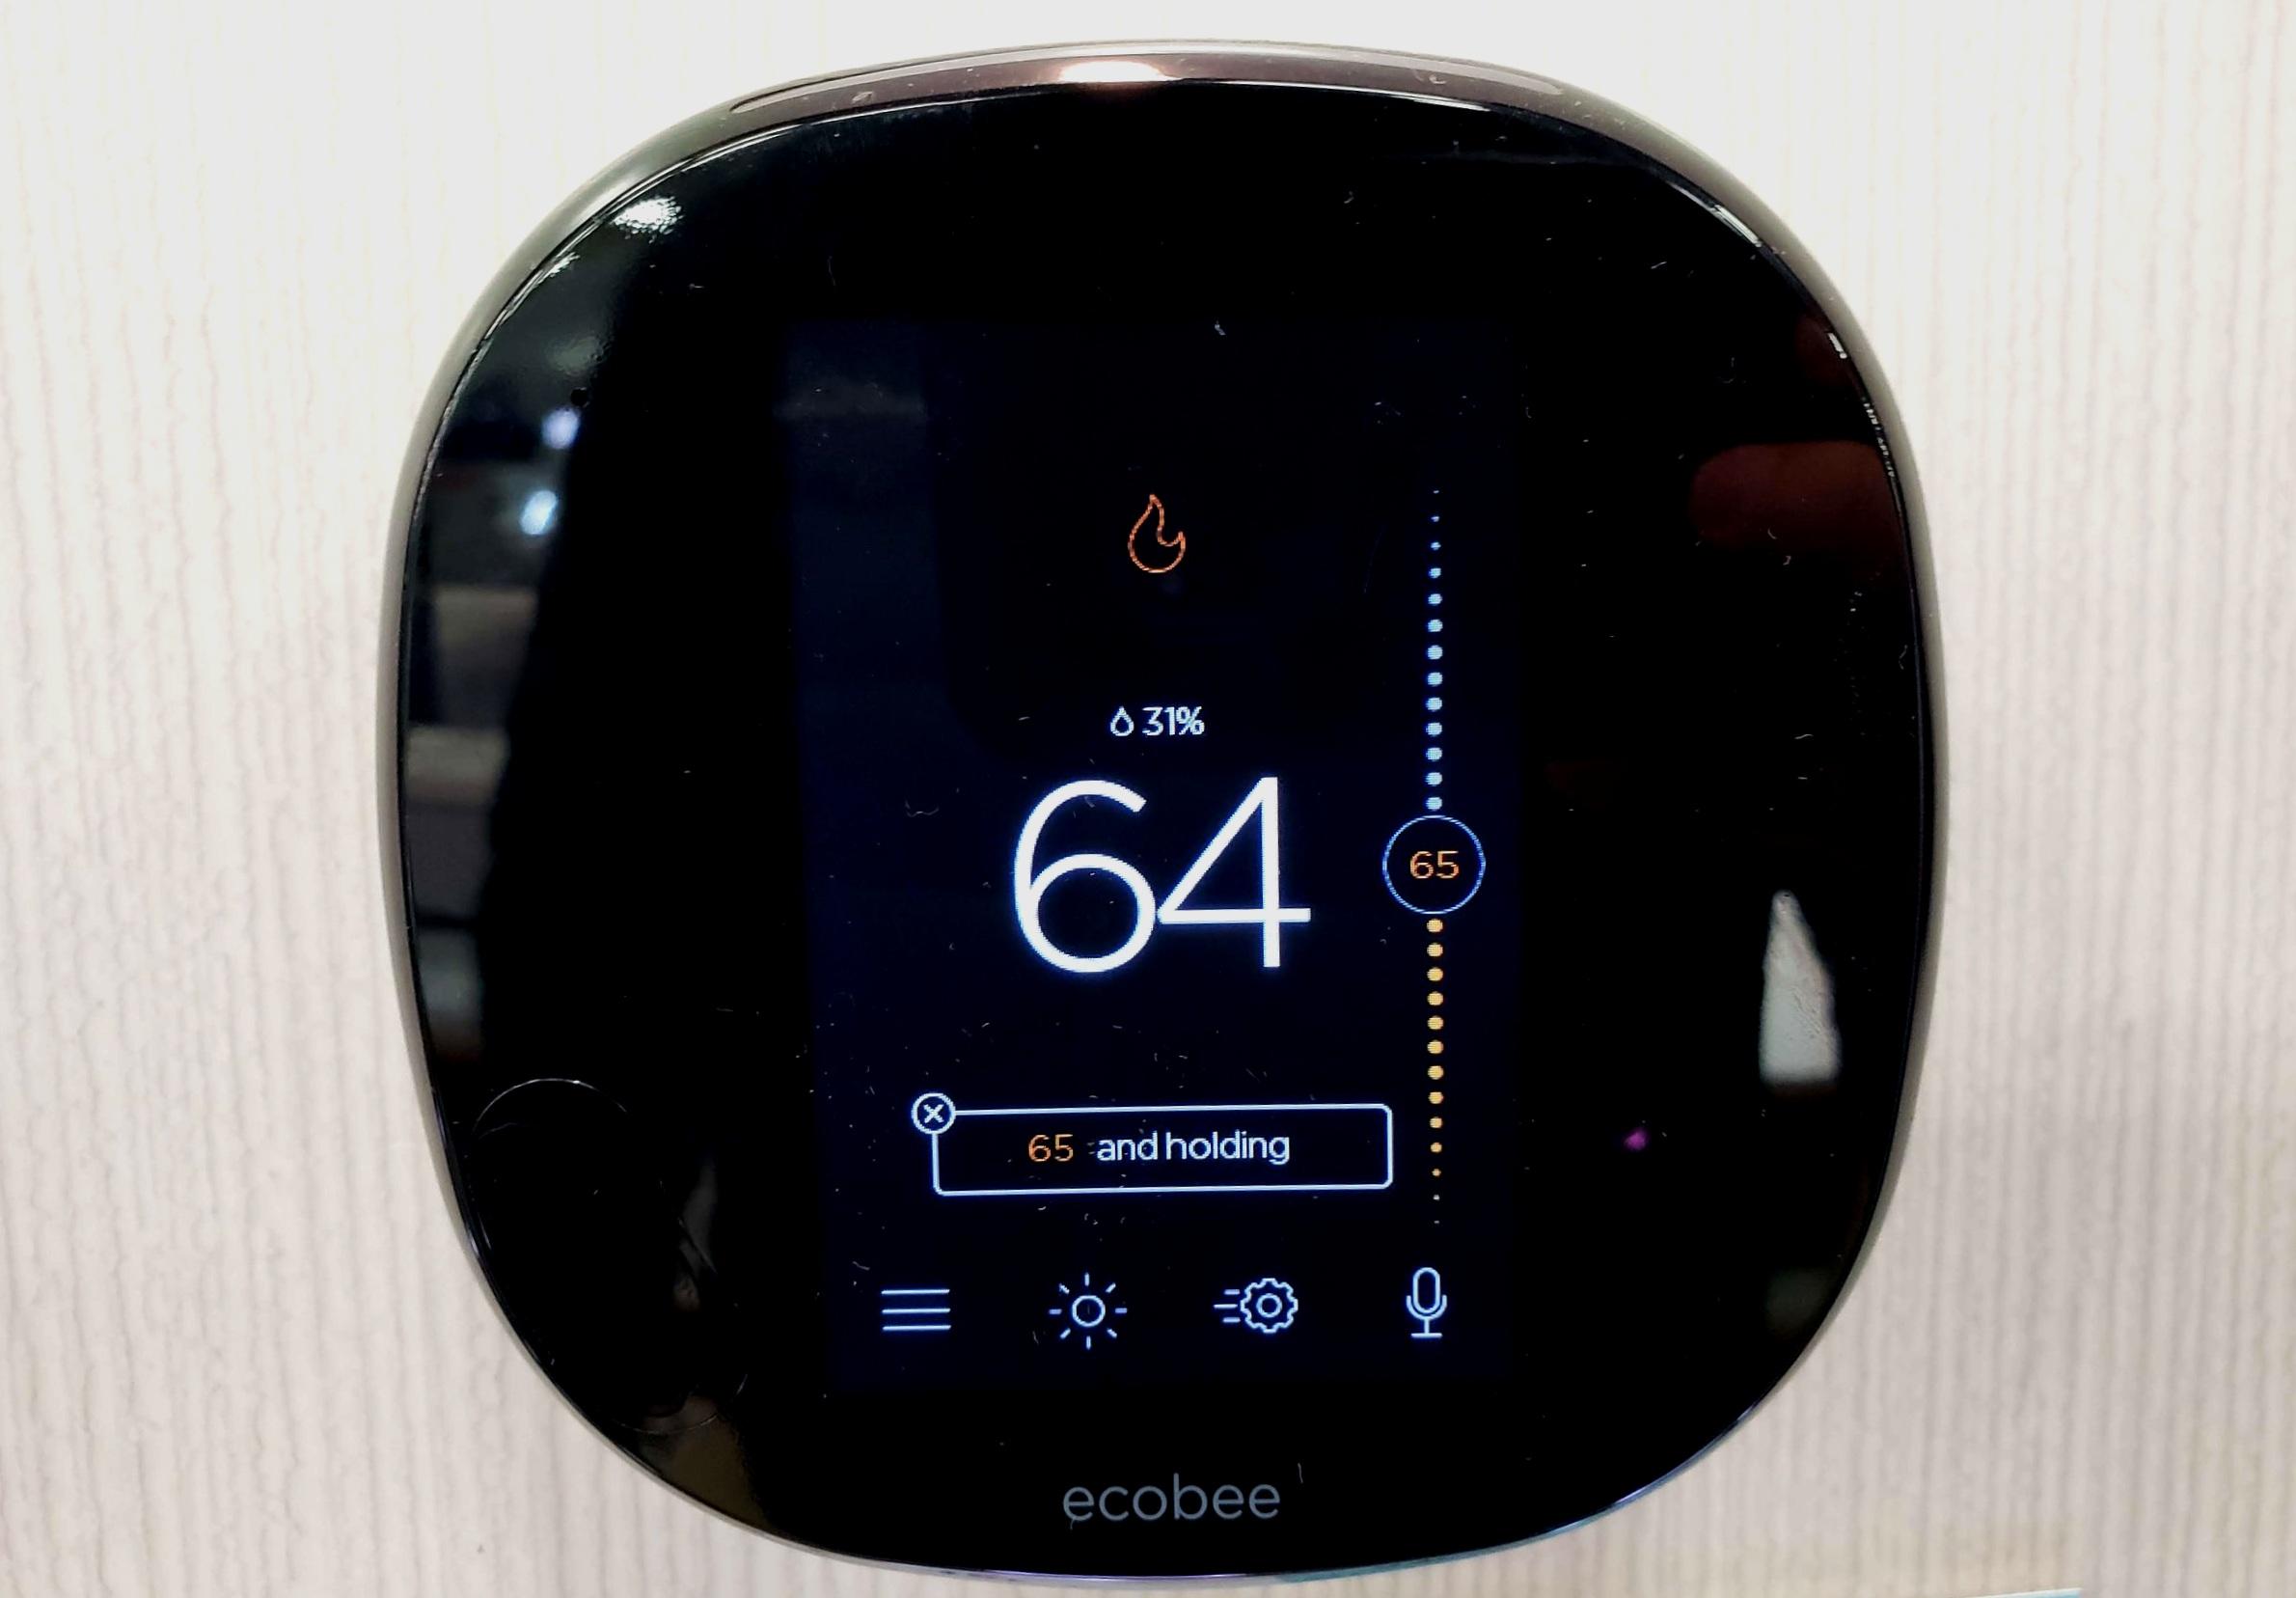 Nest vs Ecobee: Ecobee Thermostat Touch Screen Display